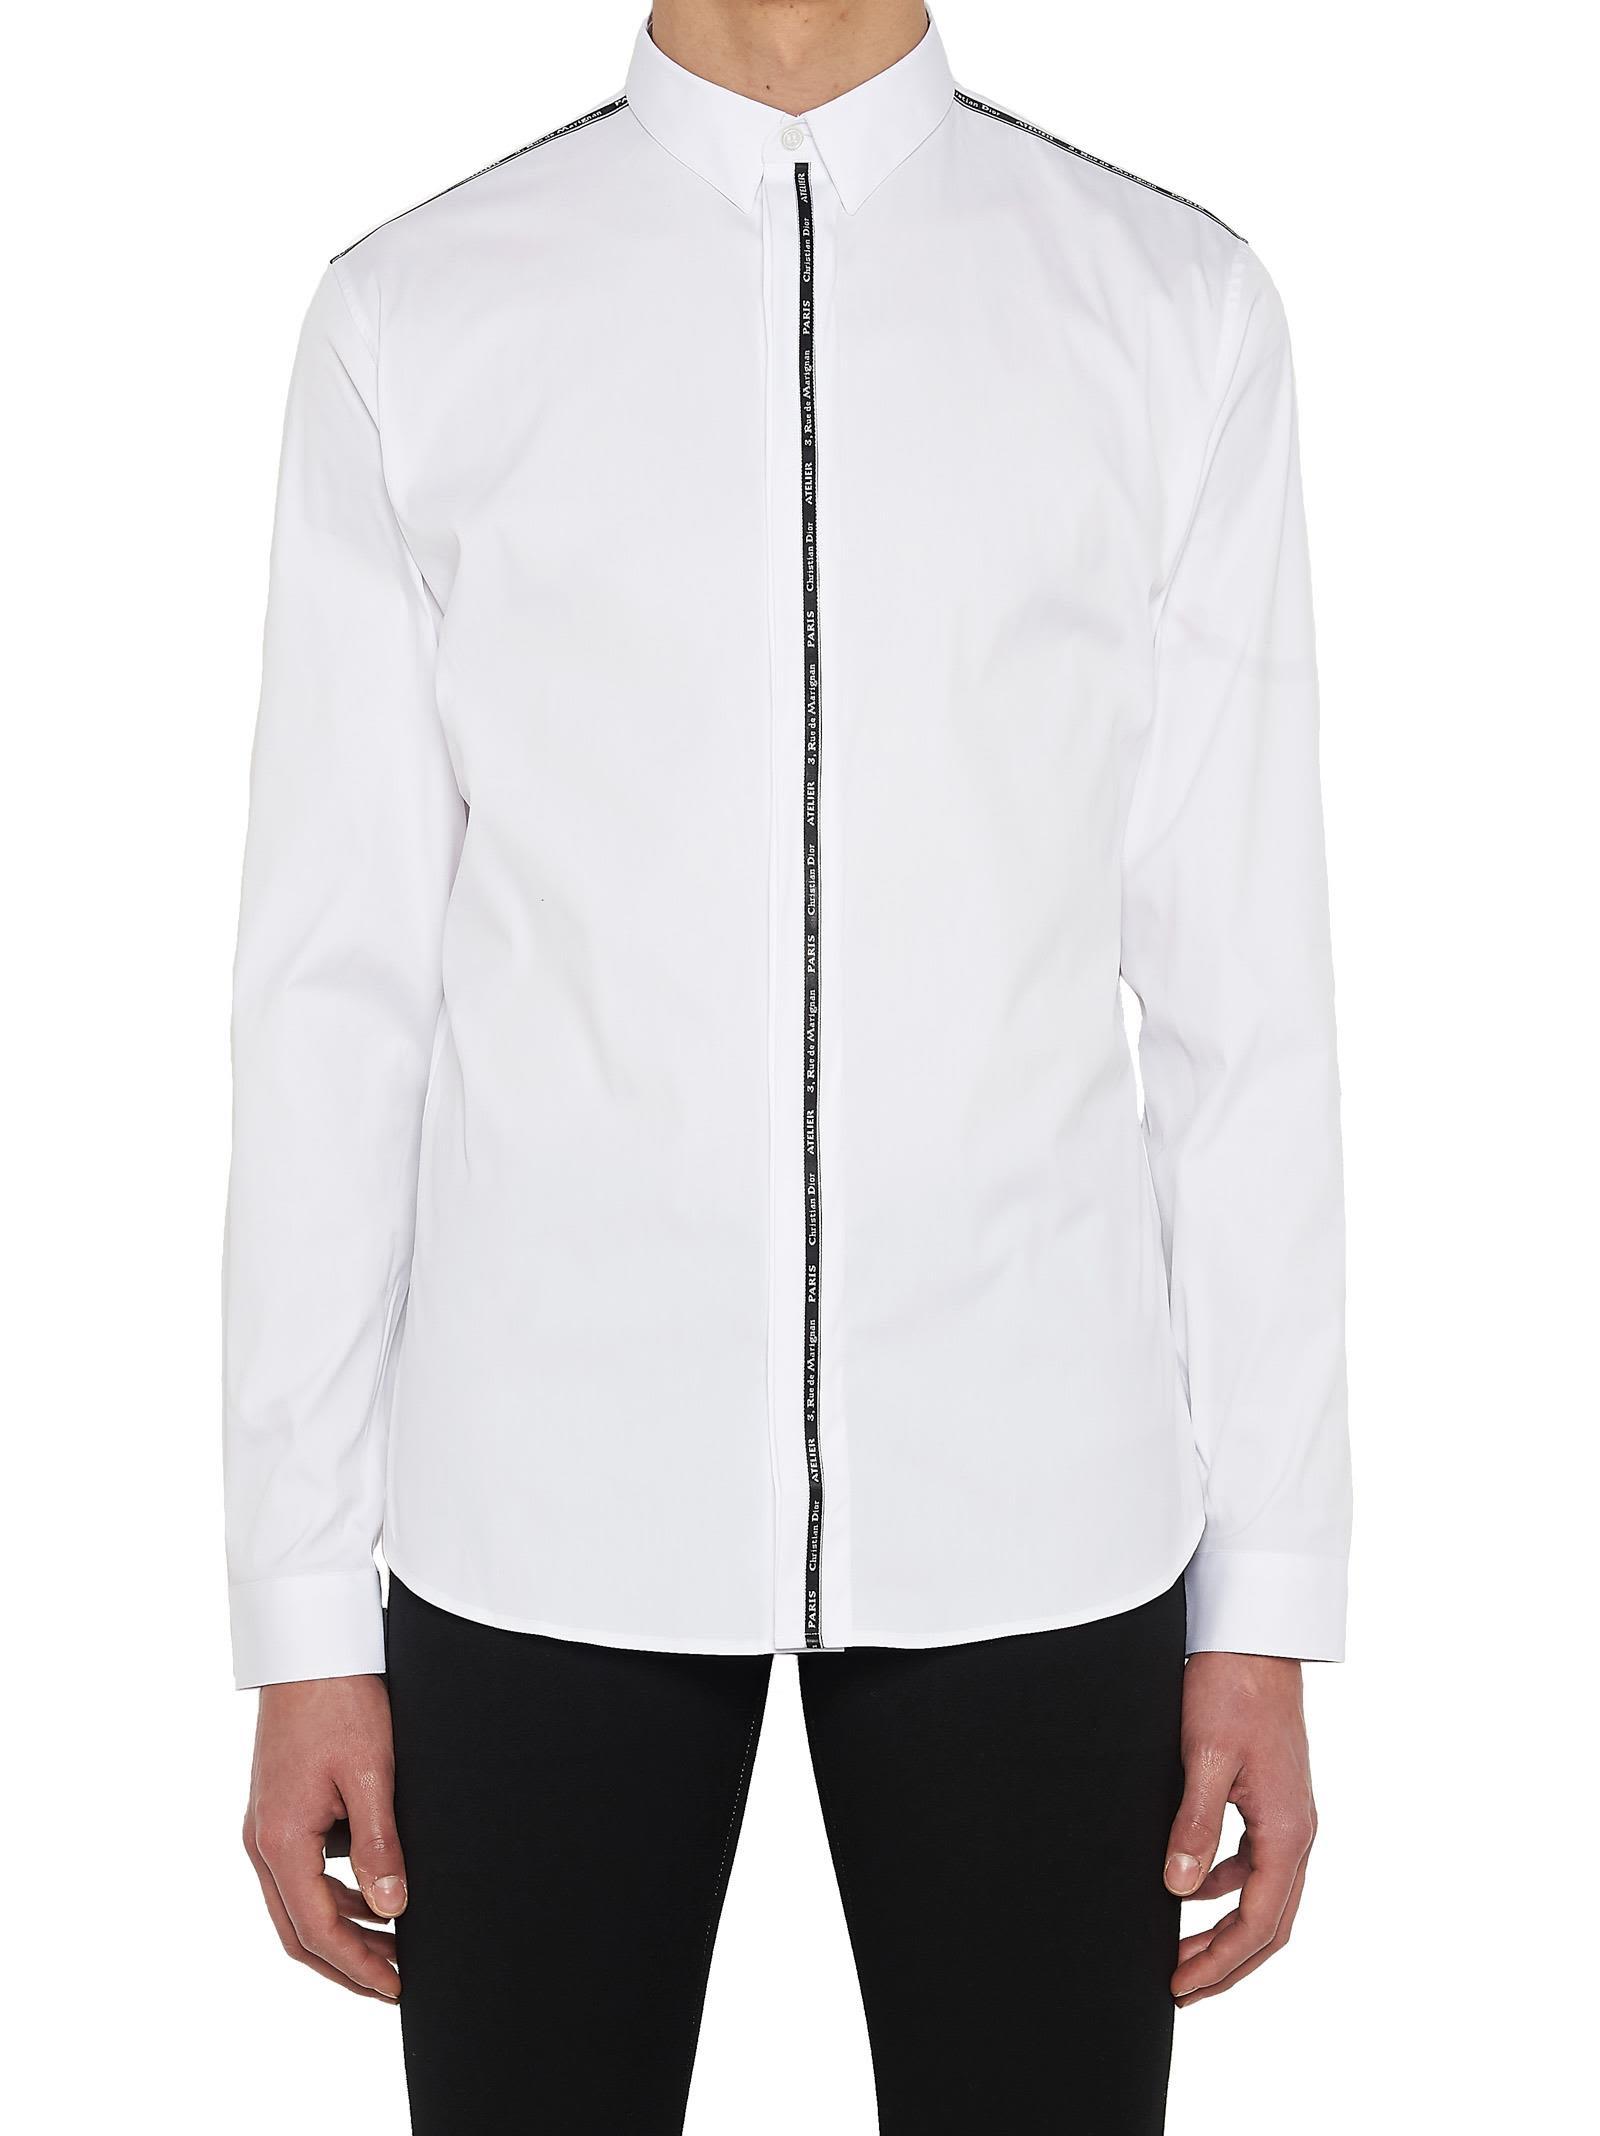 f33eb5252 Dior Homme Dior Homme 'christian Dior Atelier' Shirt - White - 10622531 |  italist